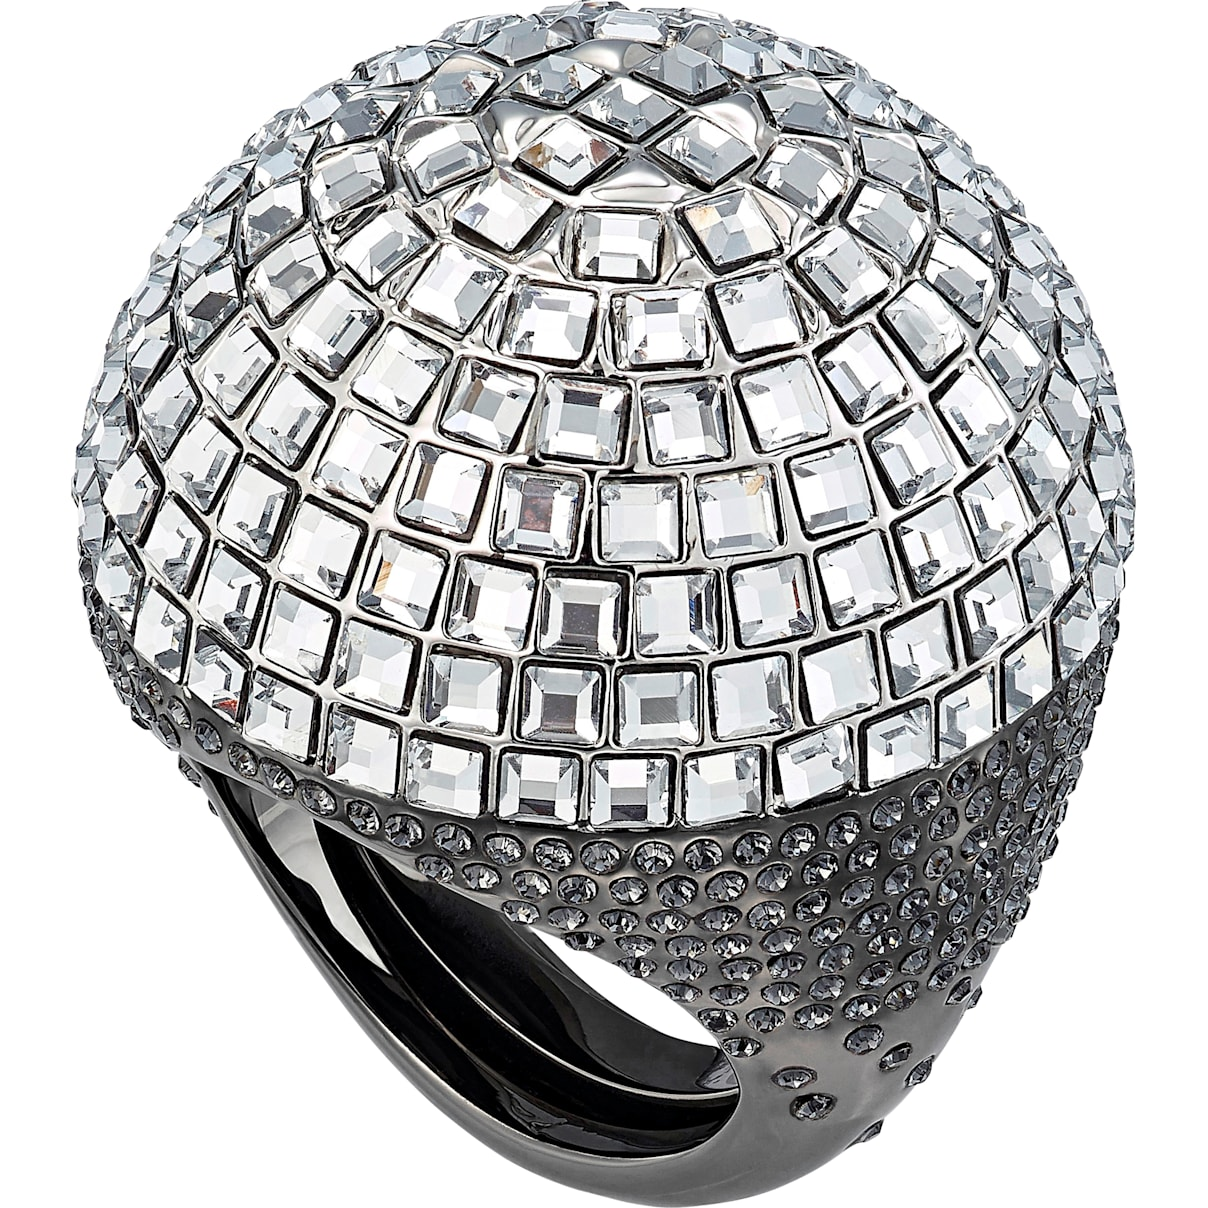 Swarovski Celestial Fit Cocktail Ring, Gray, Black Ruthenium